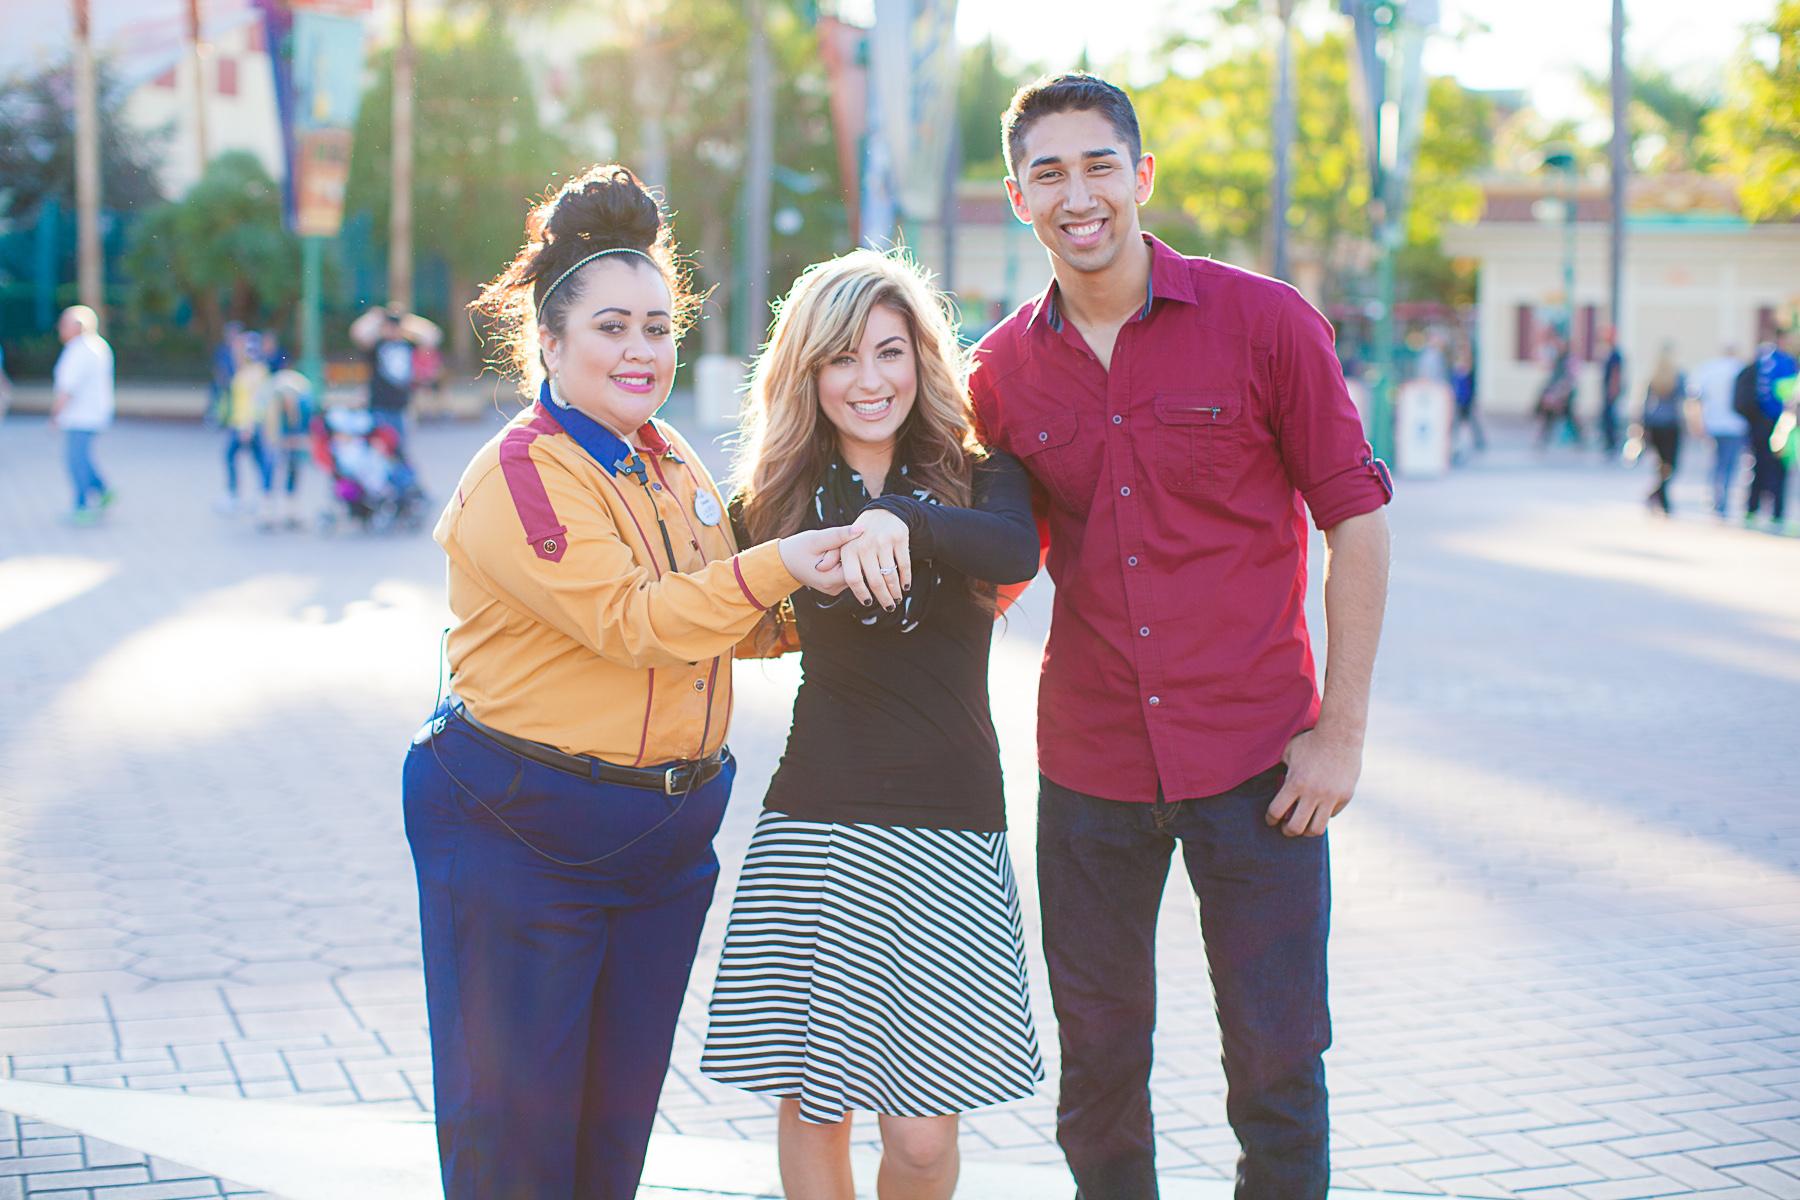 Image 8 of Magical Disneyland Proposal